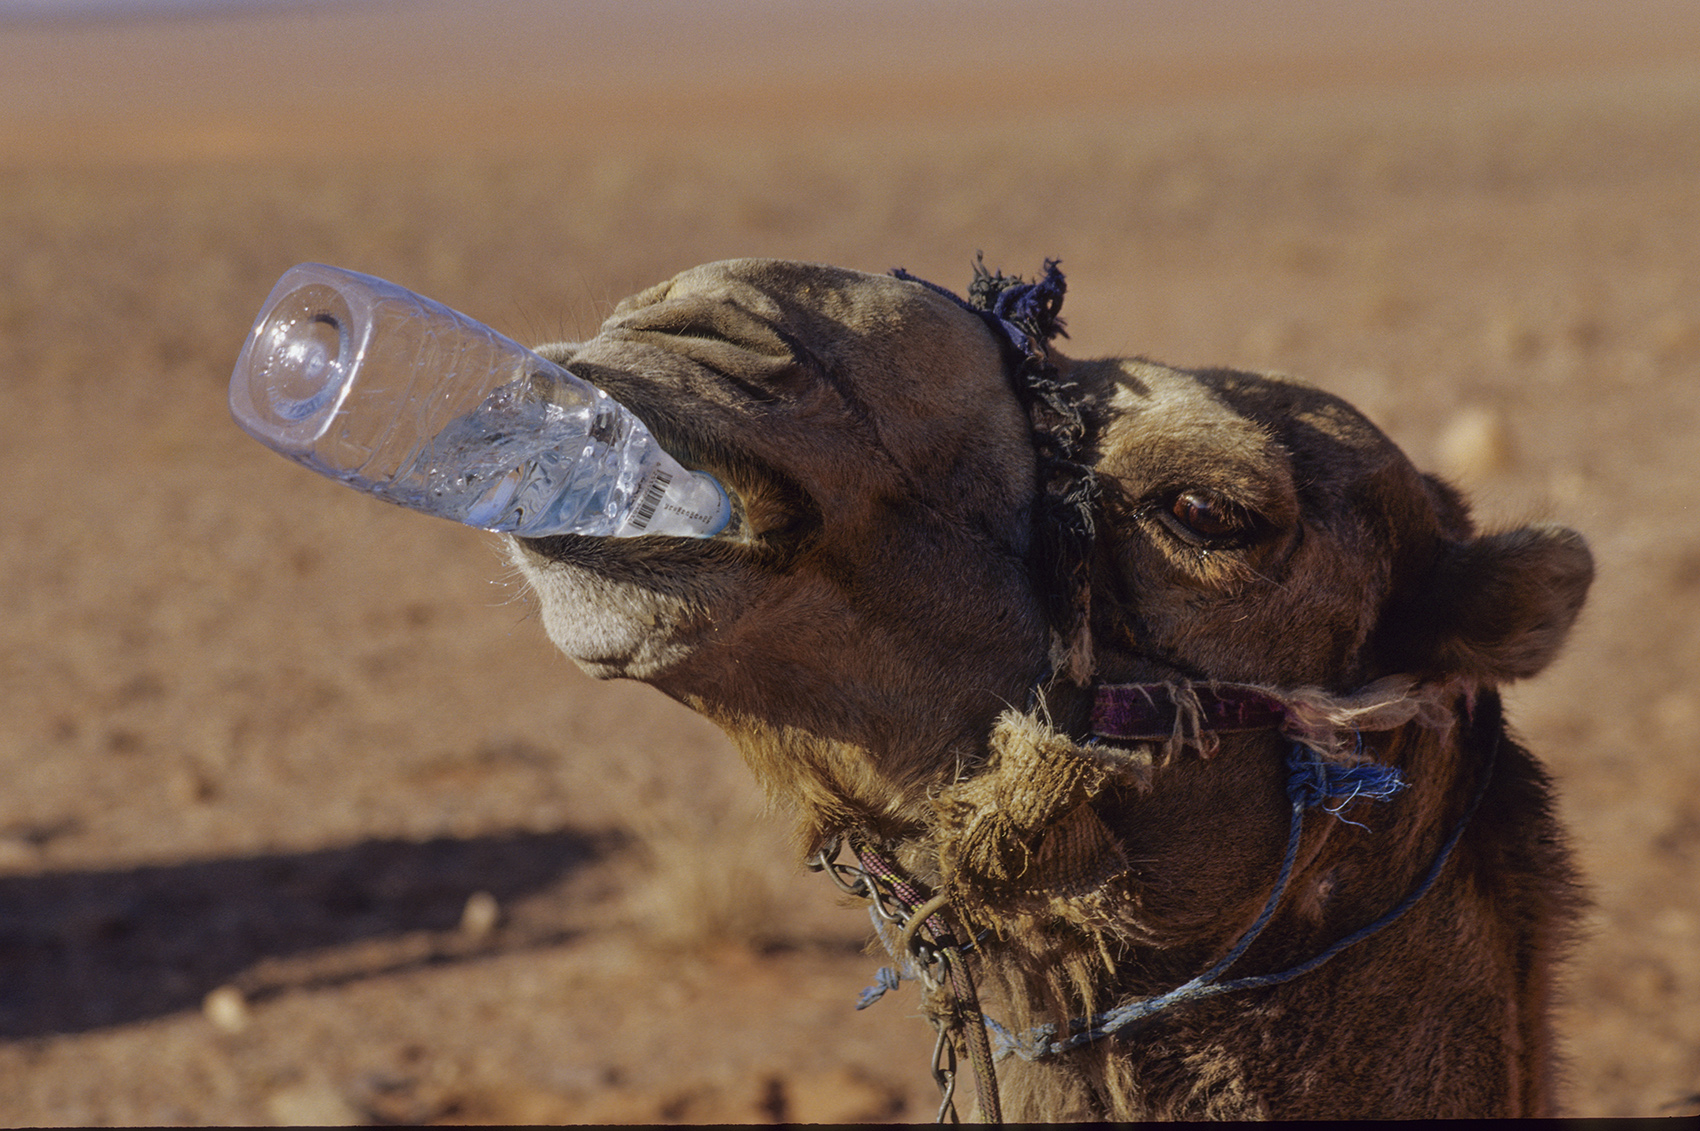 Thirsty camel